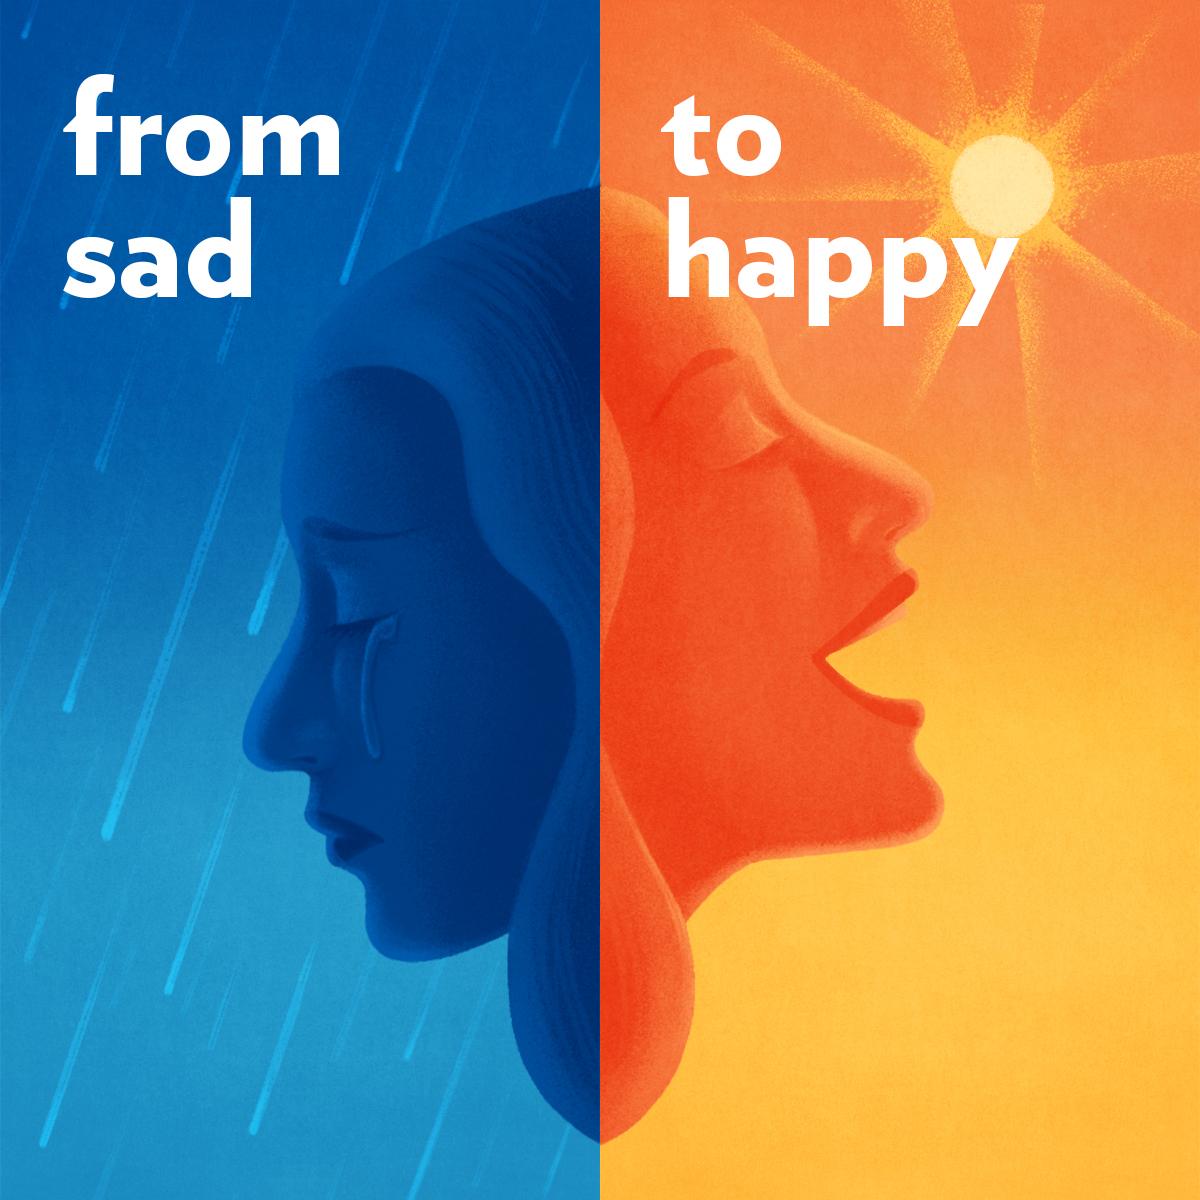 Sad-Happy_Instagram.jpg